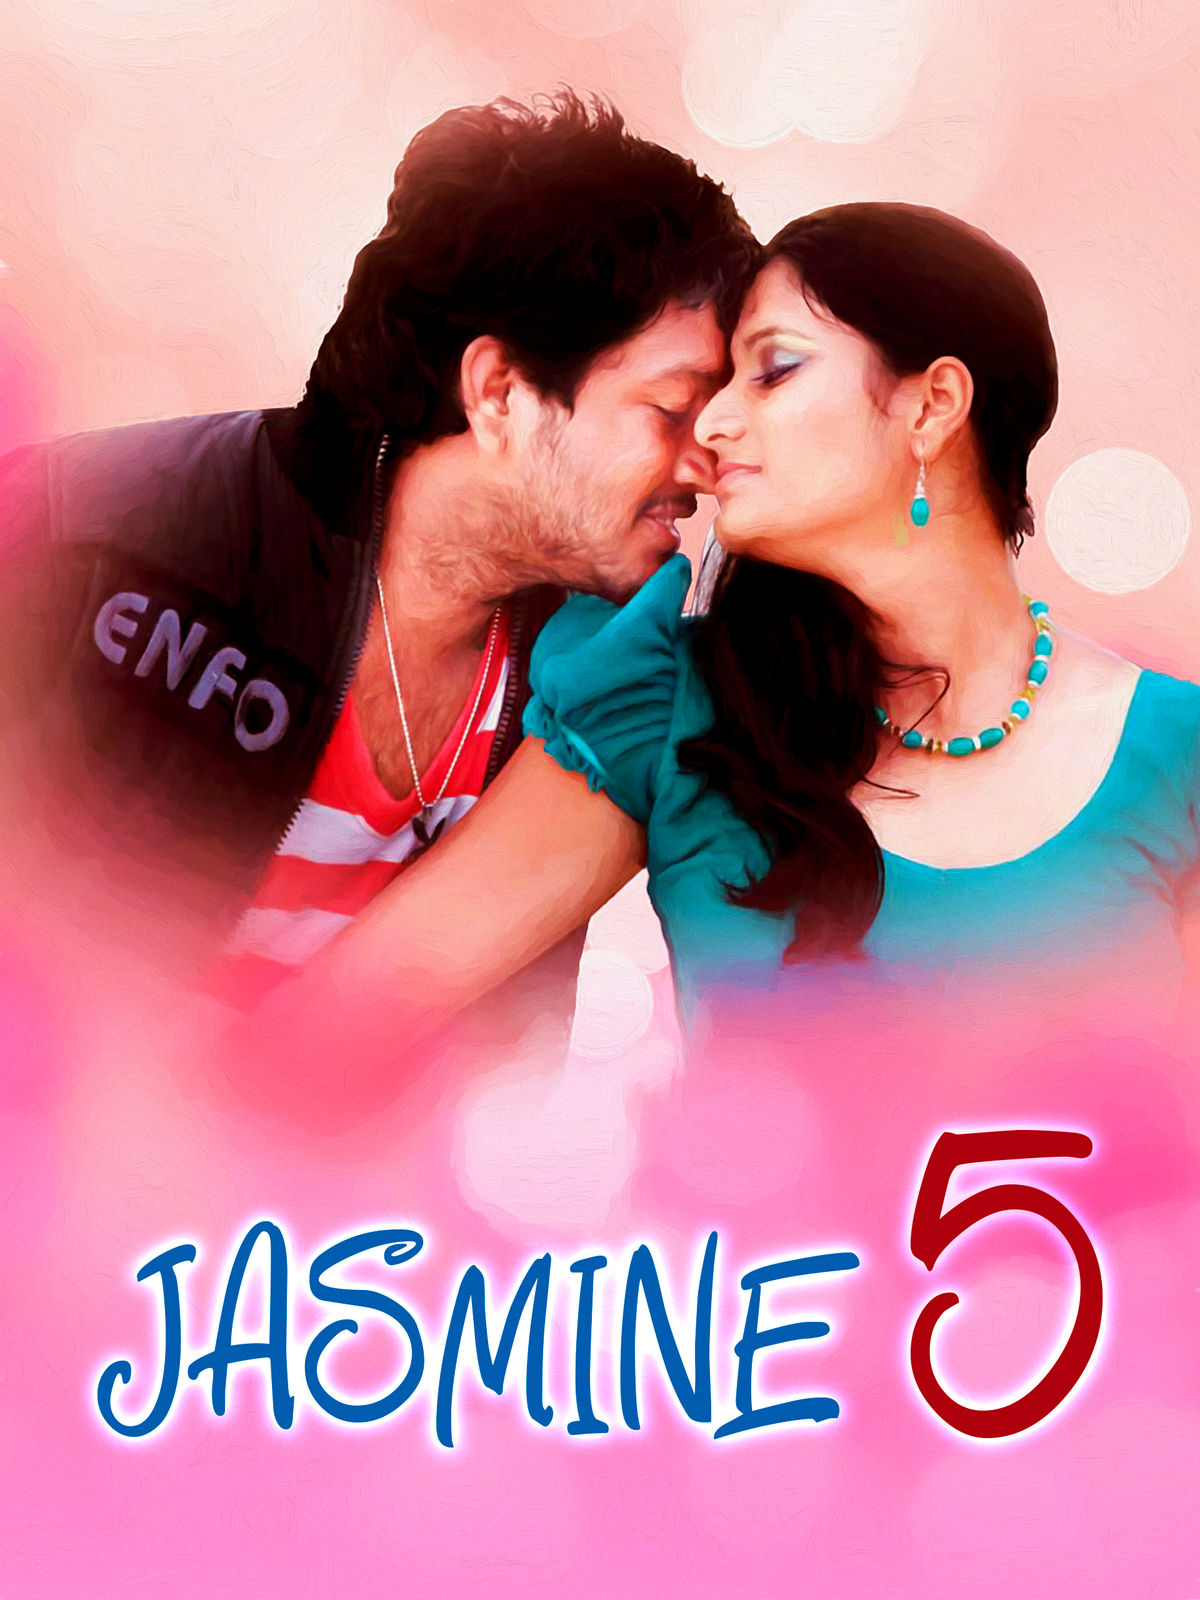 Jasmine 5